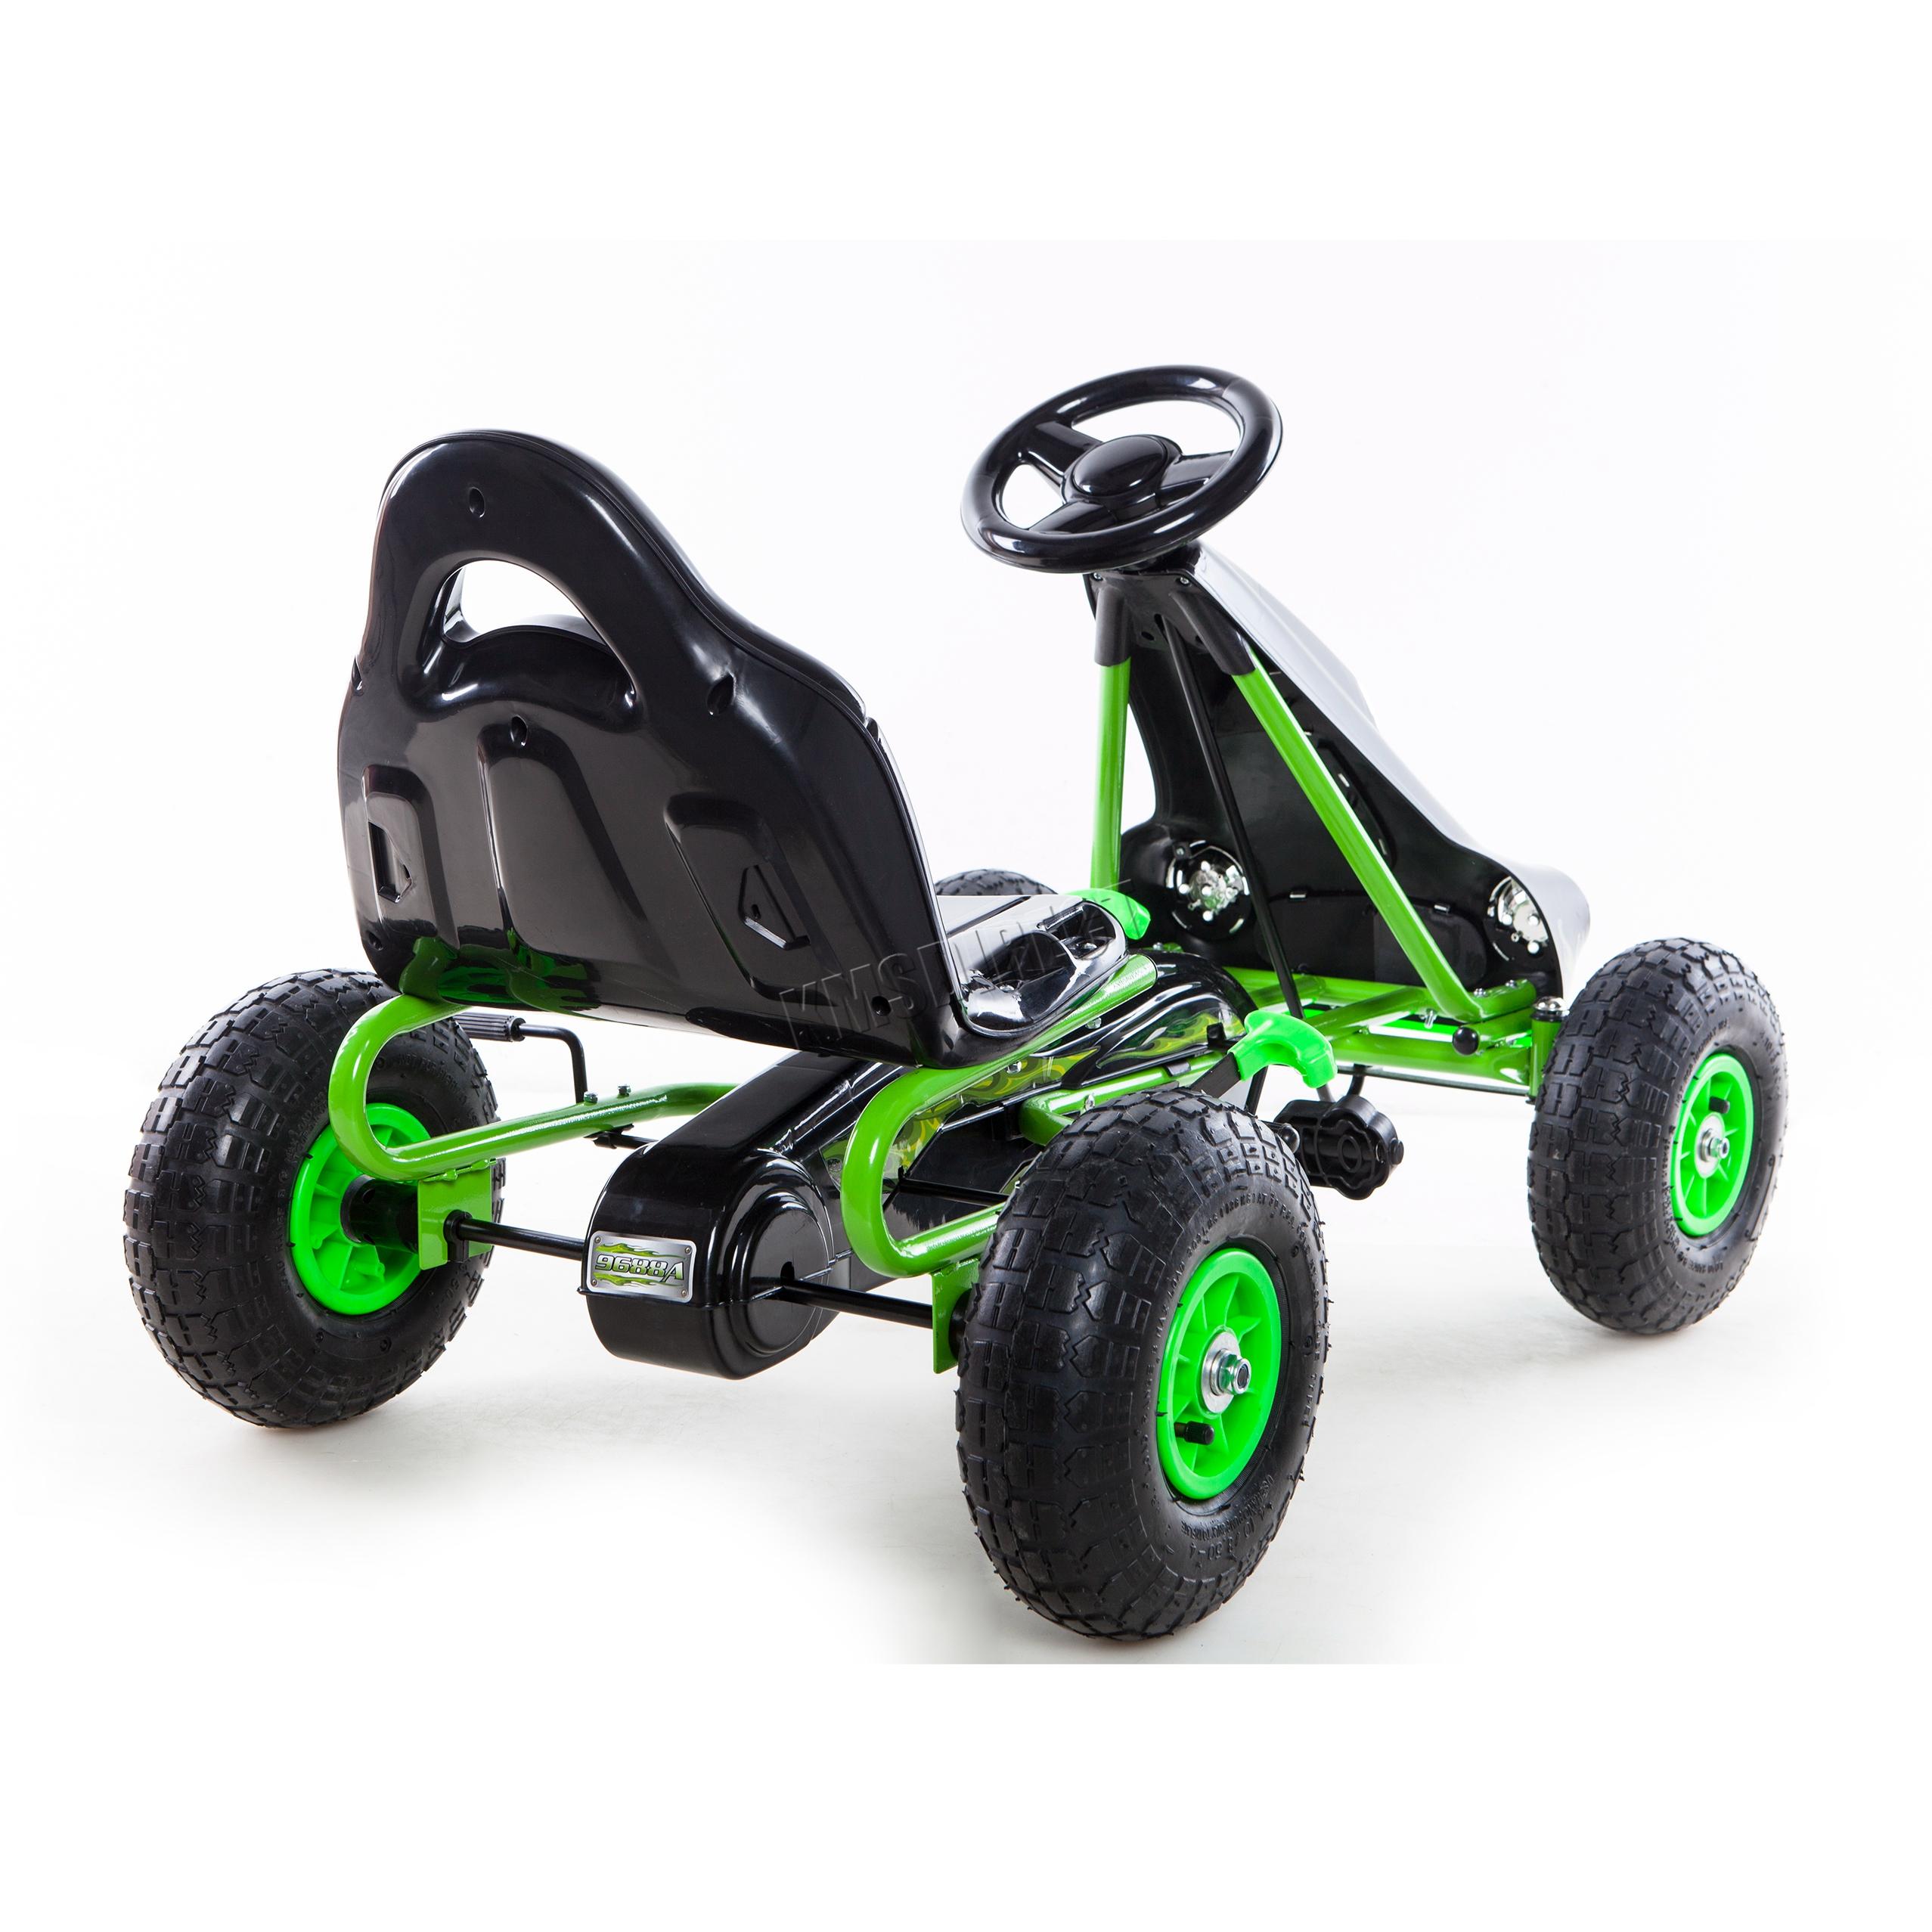 FoxHunter Kids Child Go Kart Ride On Car Pedal Rubber Wheels ...